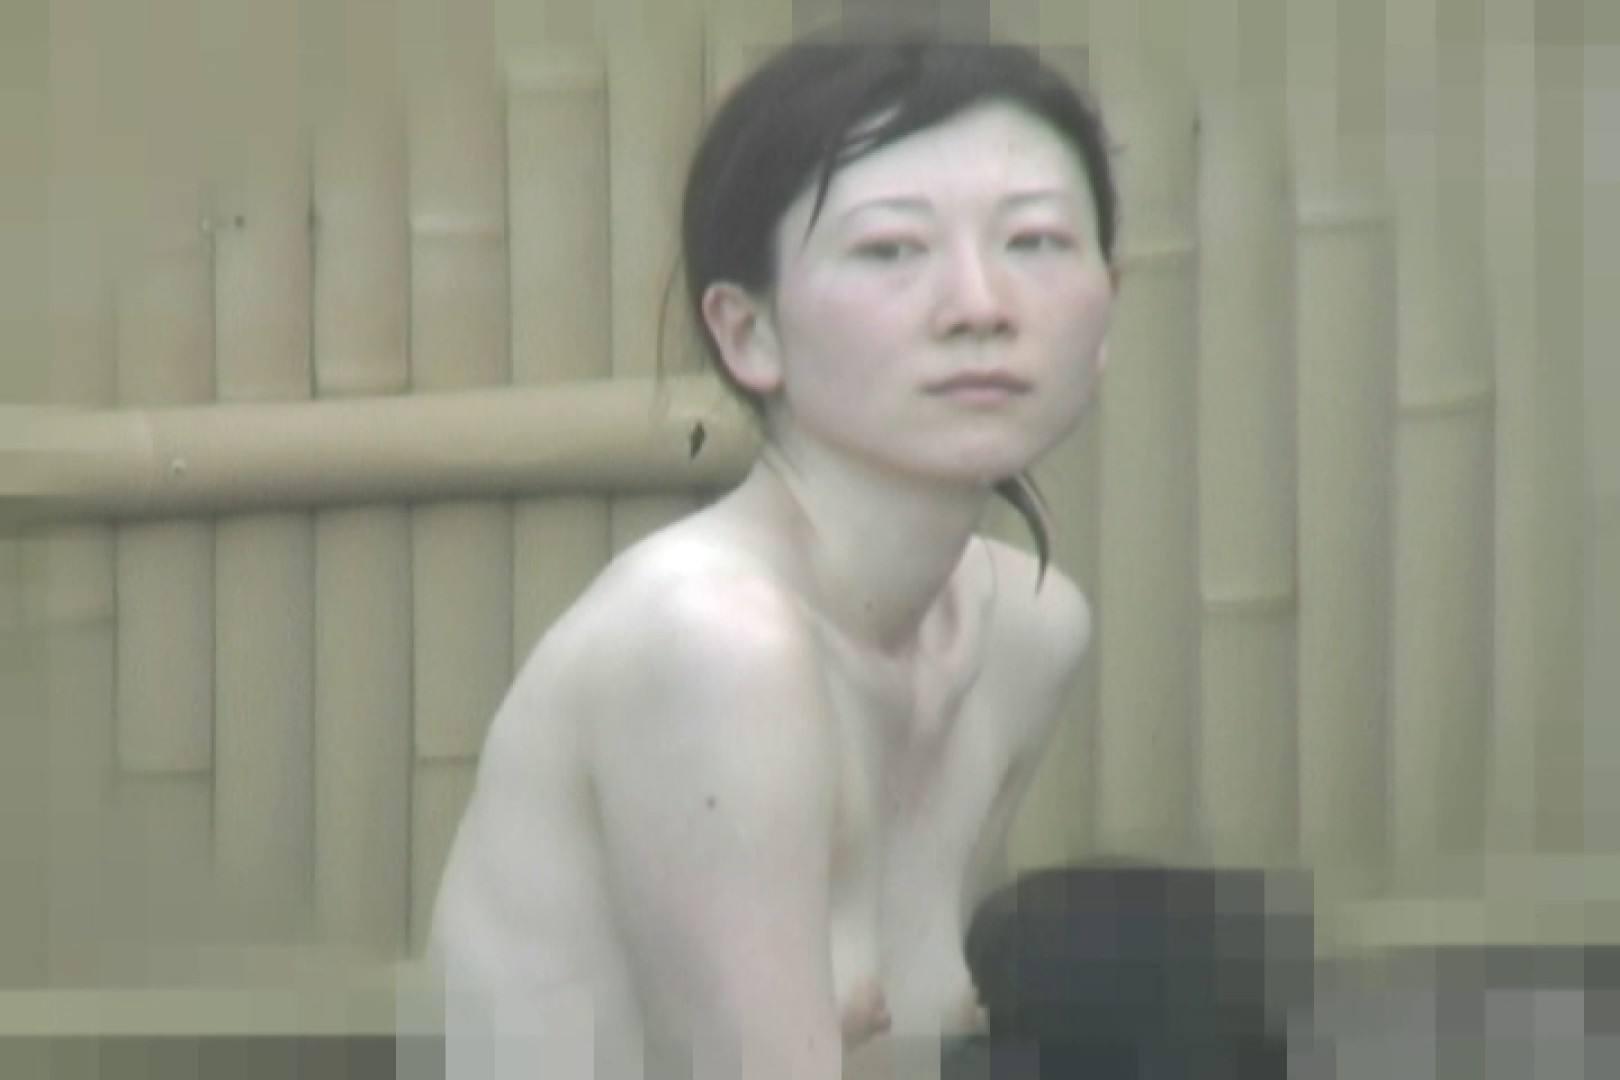 Aquaな露天風呂Vol.835 盗撮 | HなOL  73pic 64